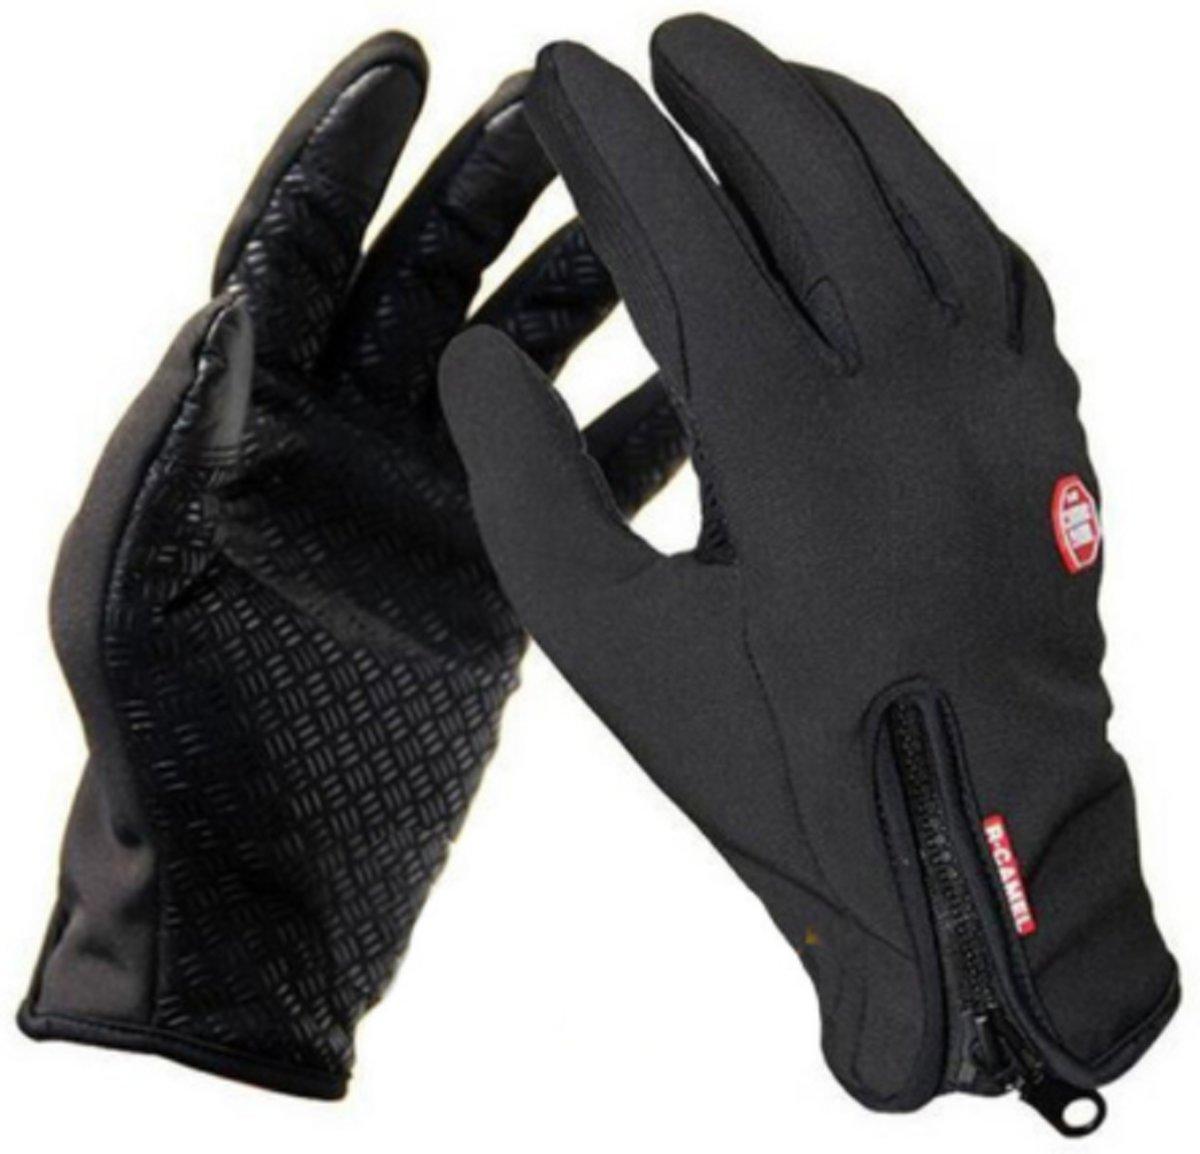 Neopreen Handschoenen XL- Wintersport - Schaatsen - Snowboarden - Skiën - Wielrennen - Uniseks - Zwart – Extra Large